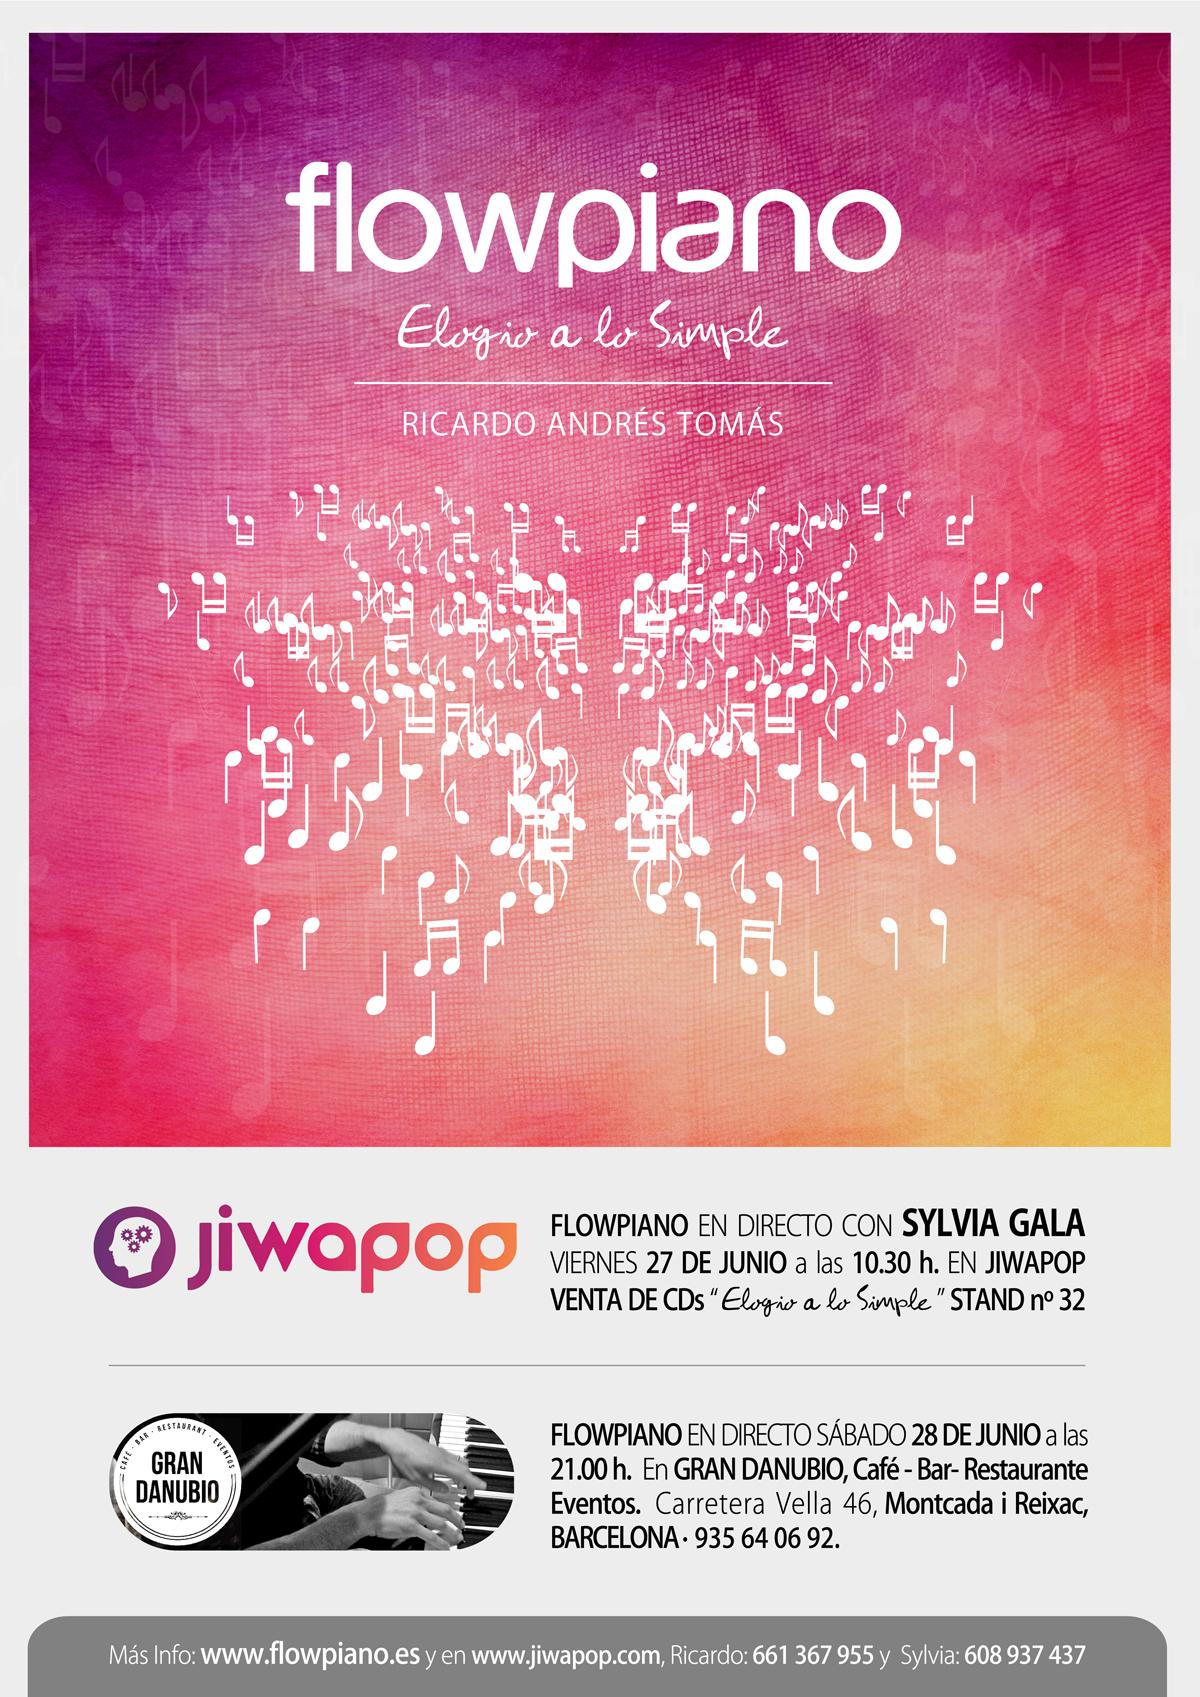 Cartell flowpiano-Jiwapop mailing